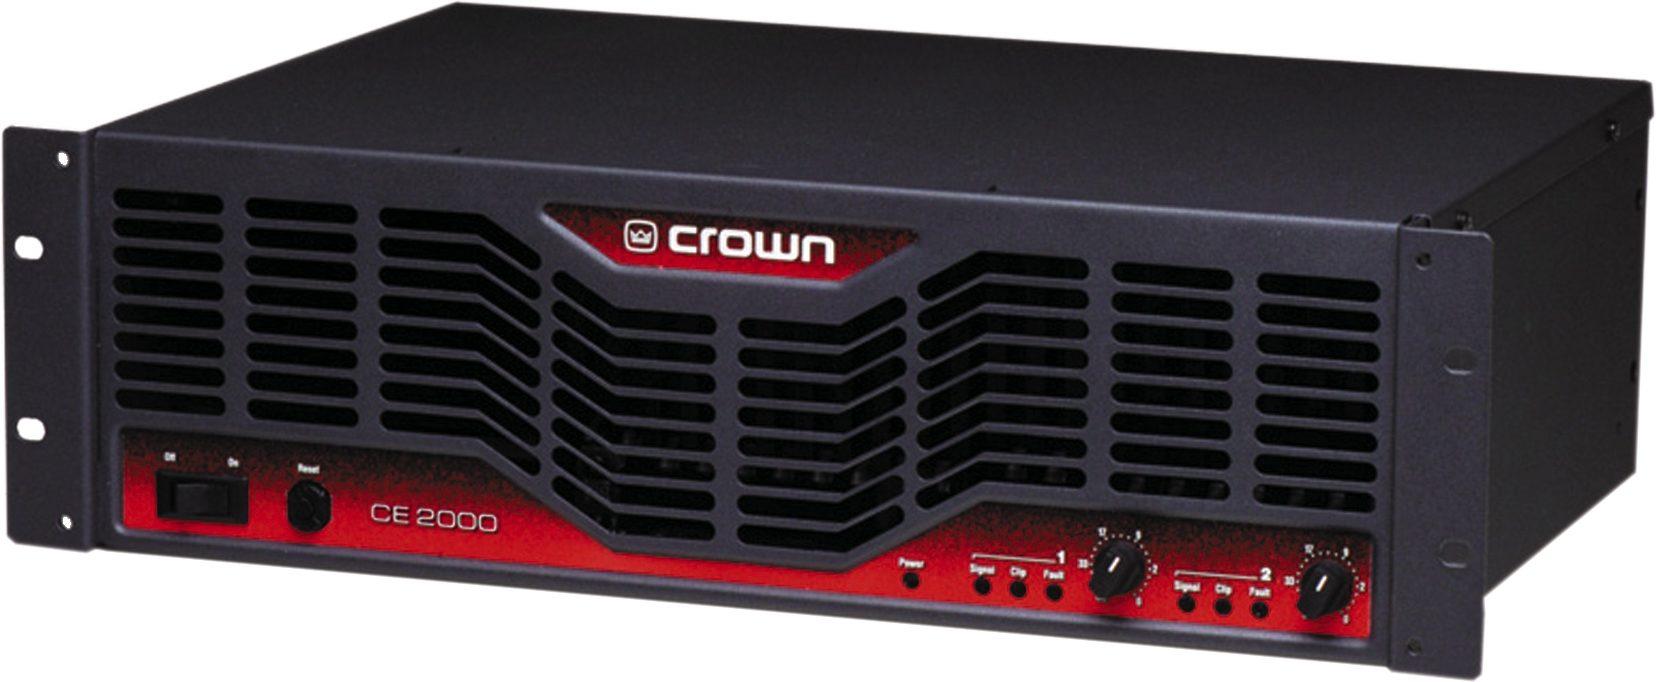 Crown x2000 power amp manual